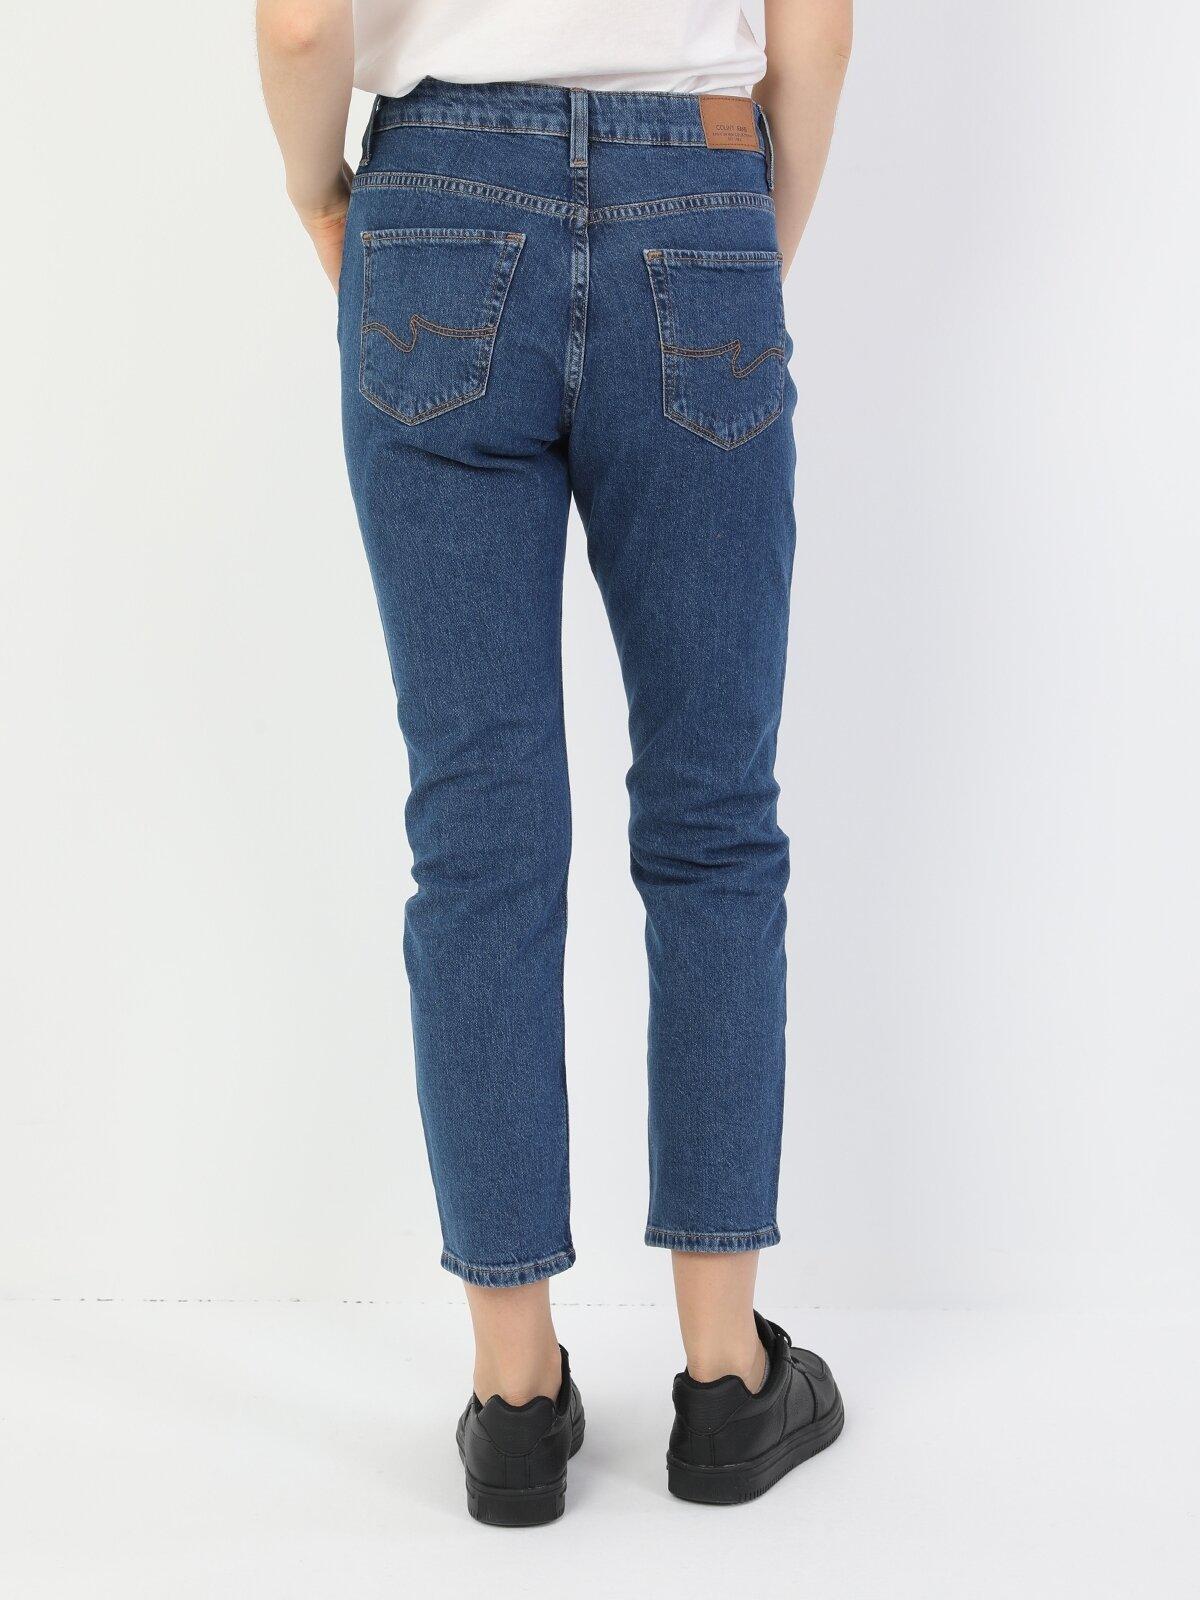 891 Maya Orta Bel Daralan Paça Slim Fit Mavi Kadın Jean Pantolon